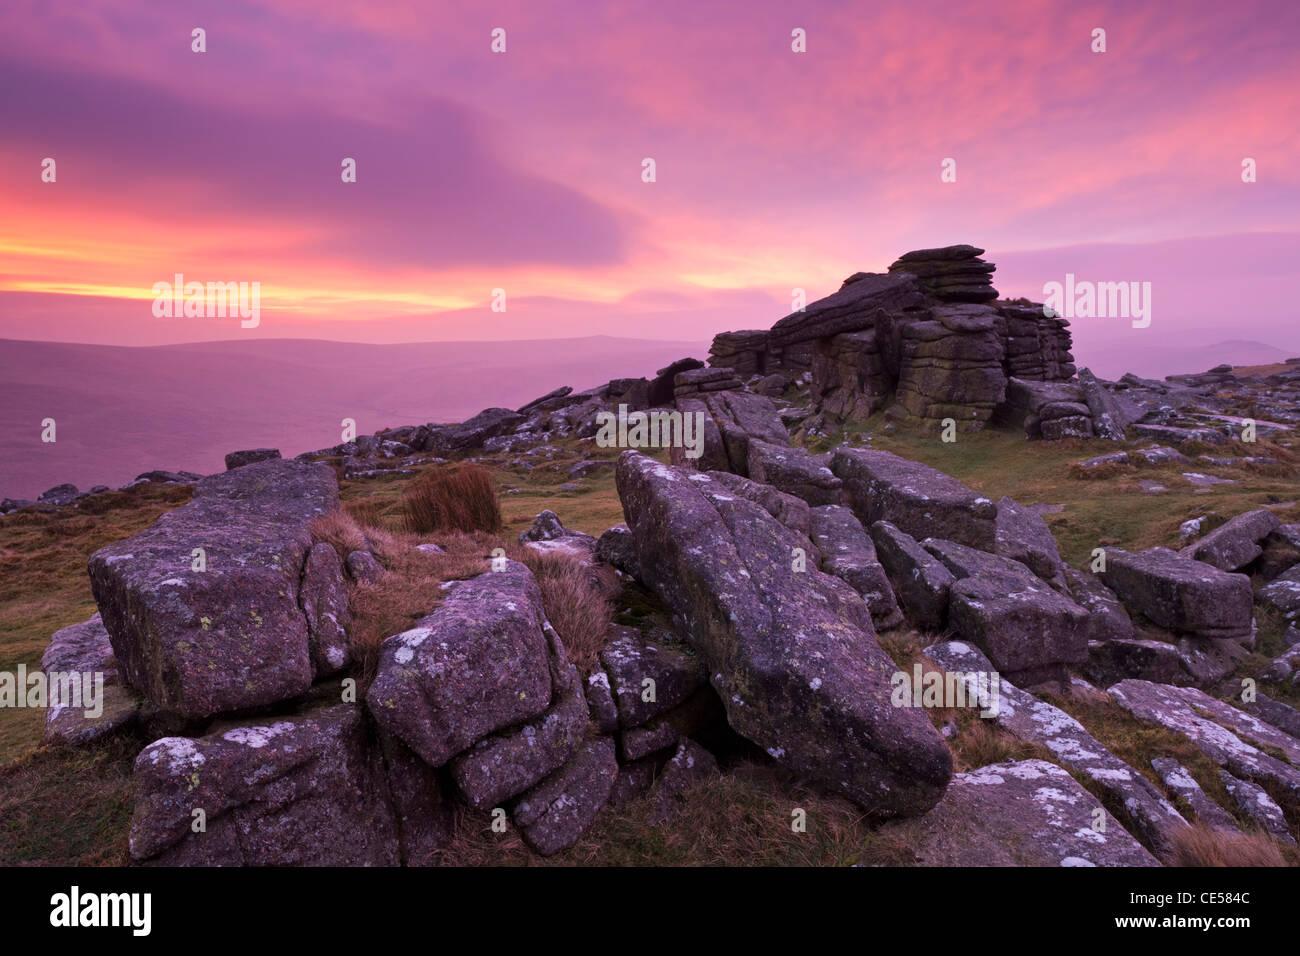 Intensa sopra sunrise Belstone Tor, Dartmoor Devon, Inghilterra. Inverno (gennaio 2012). Foto Stock